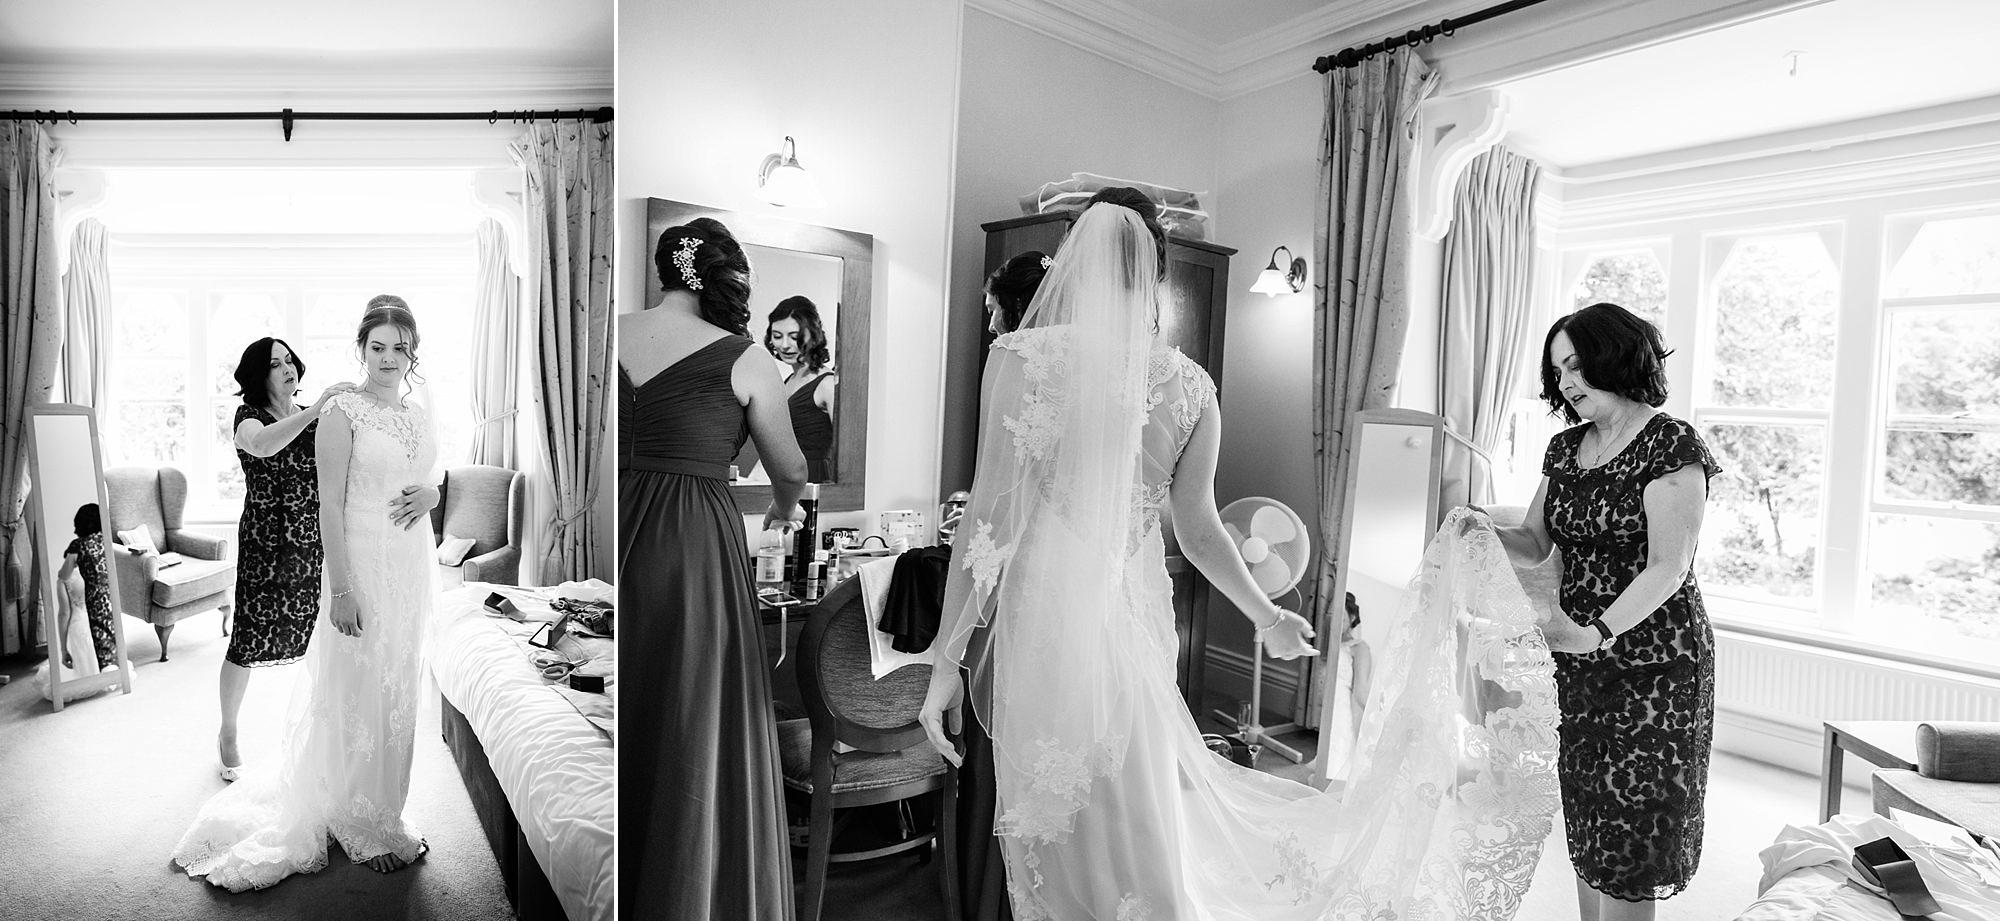 Canon Lane Chichester wedding bride getting into dress